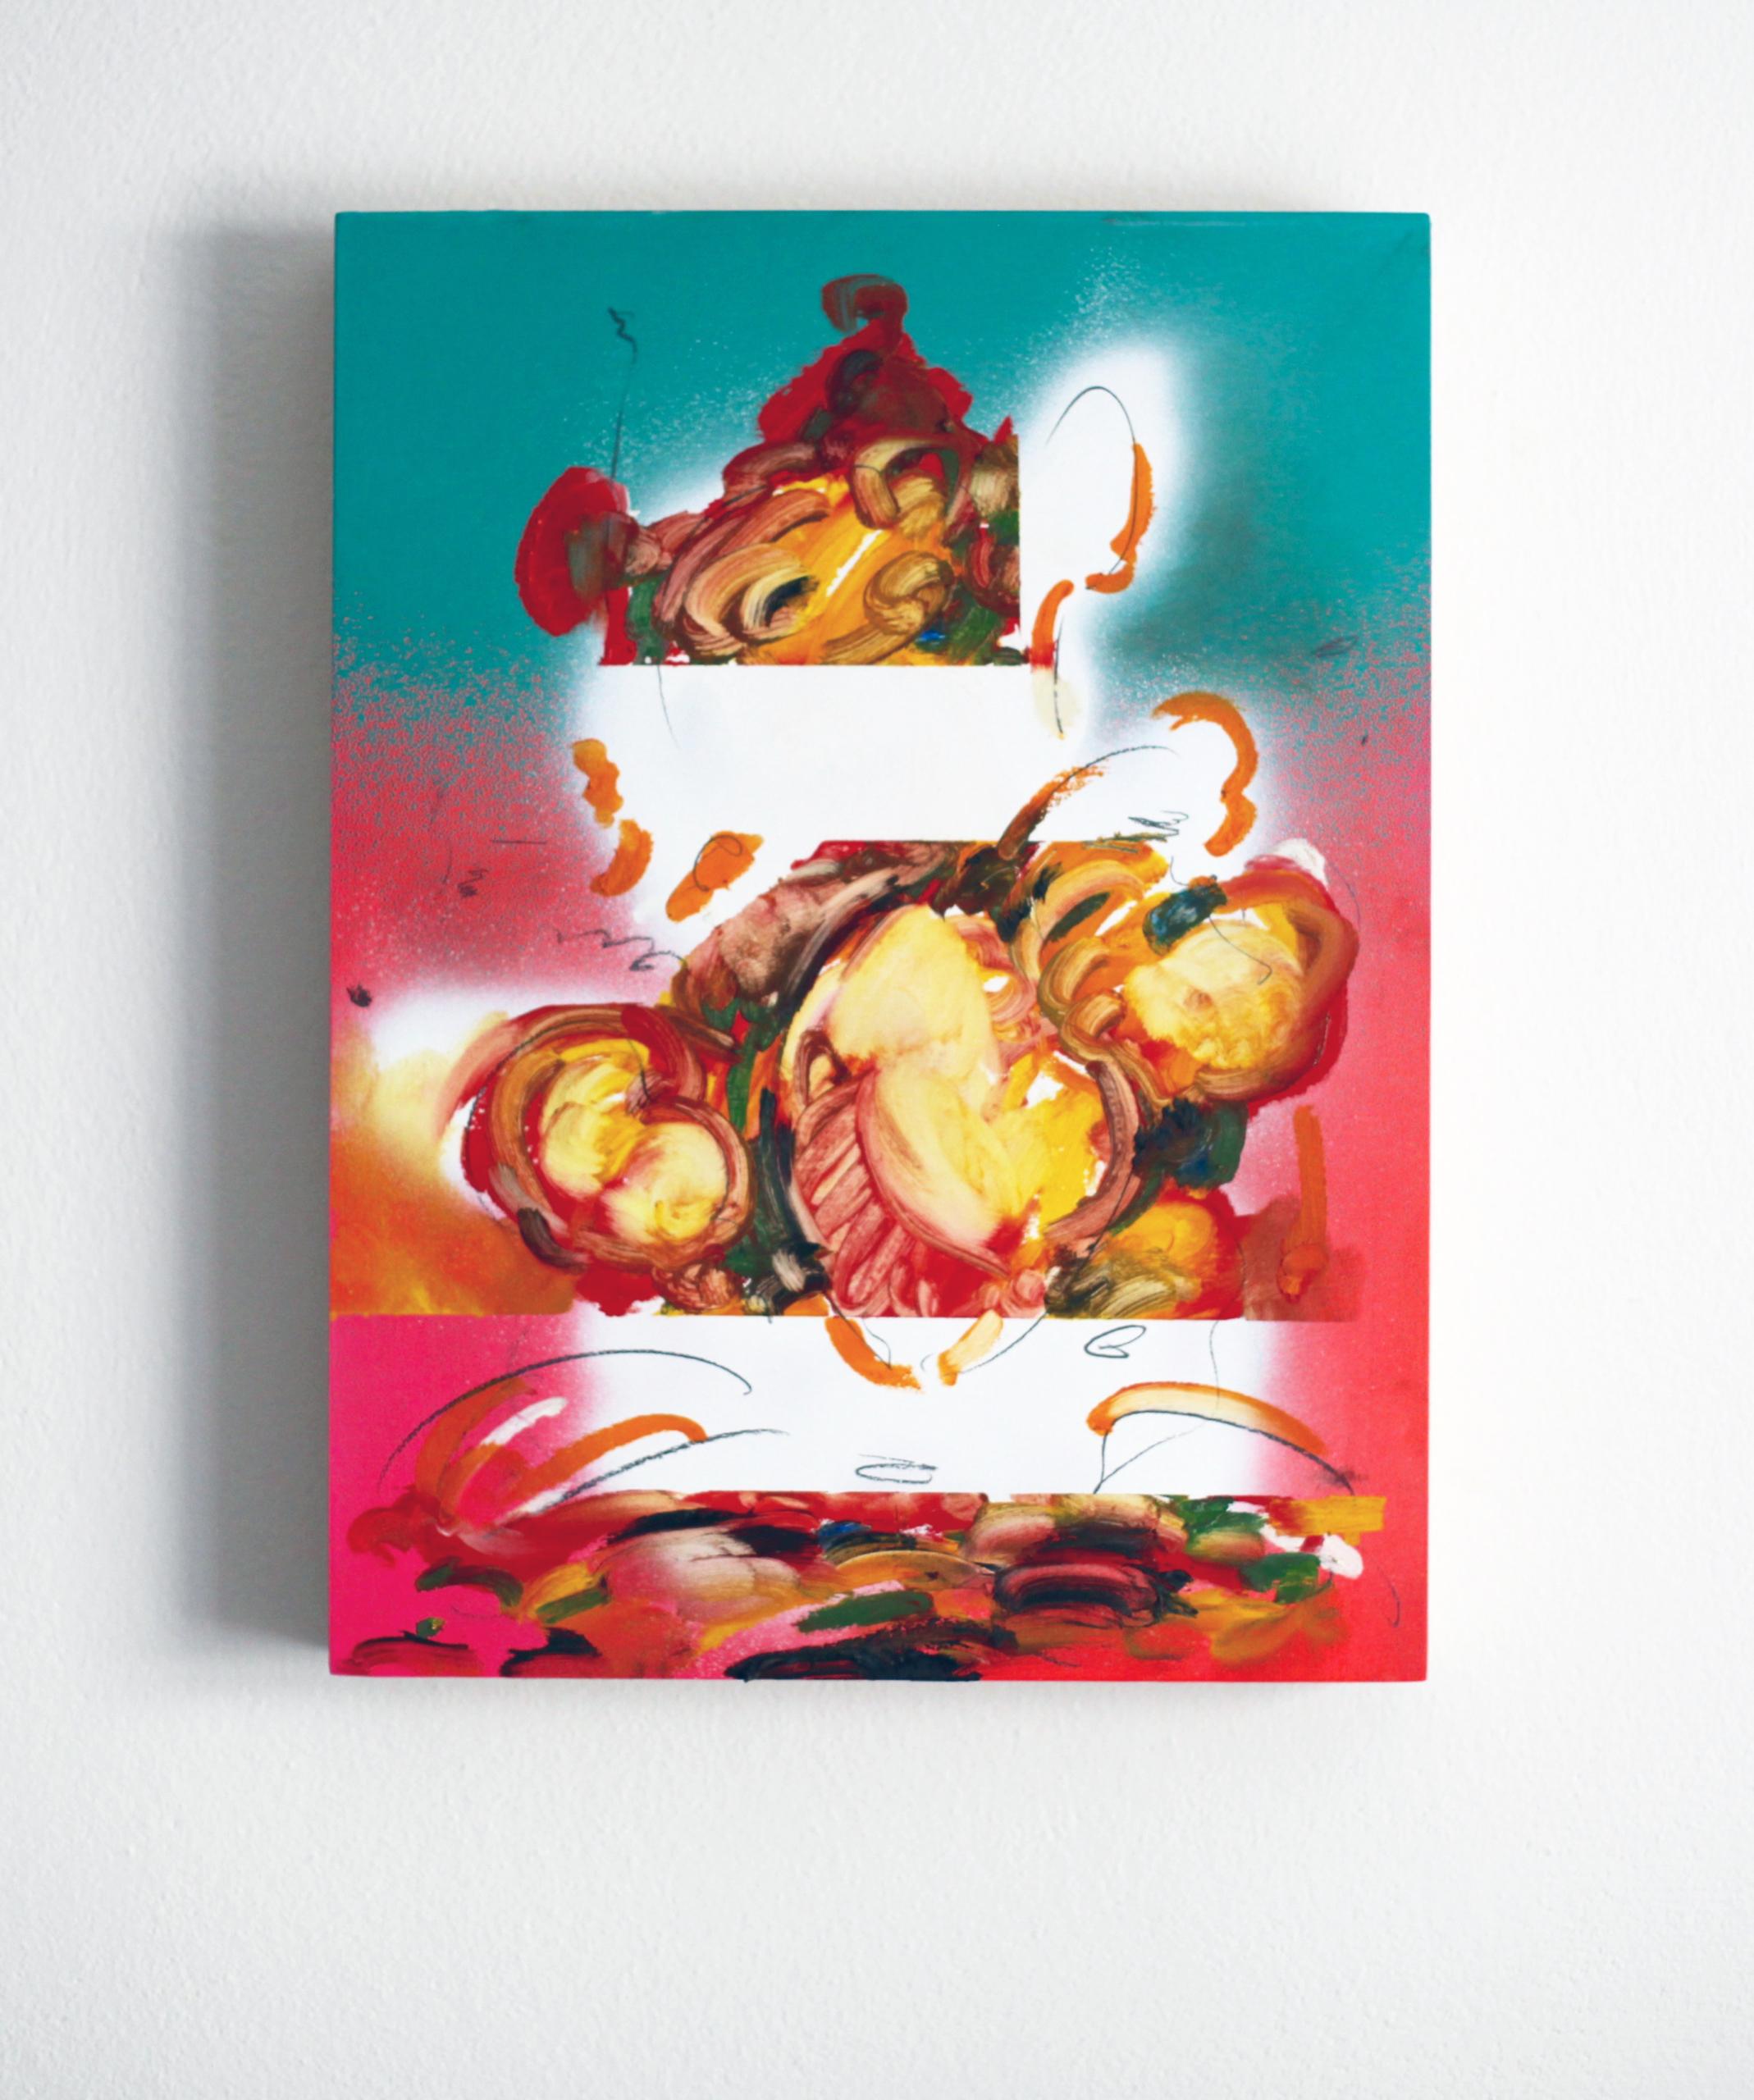 Edwin Burdis, L'Breast 1, 2017. Oil, acrylic spray paint and pencil on plywood with audio (00:02:00). 30.5 x 40.5 x 5 cm.